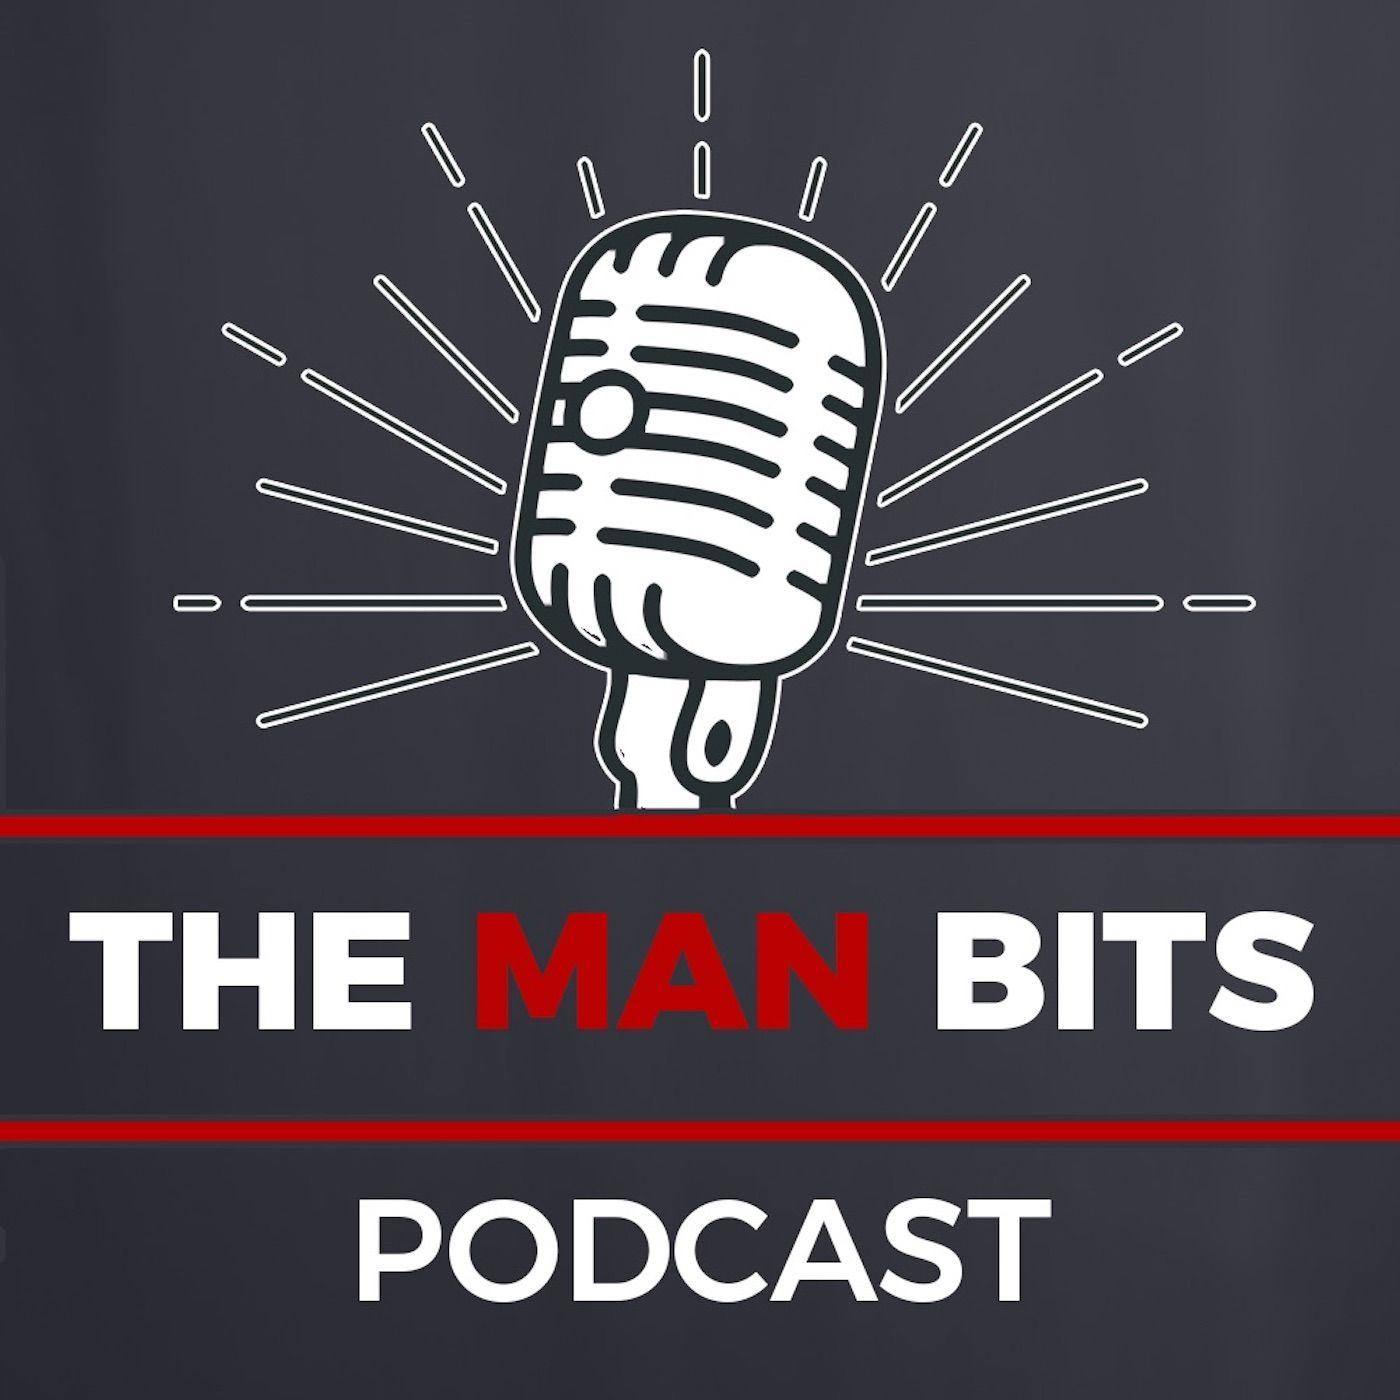 The ManBits Podcast